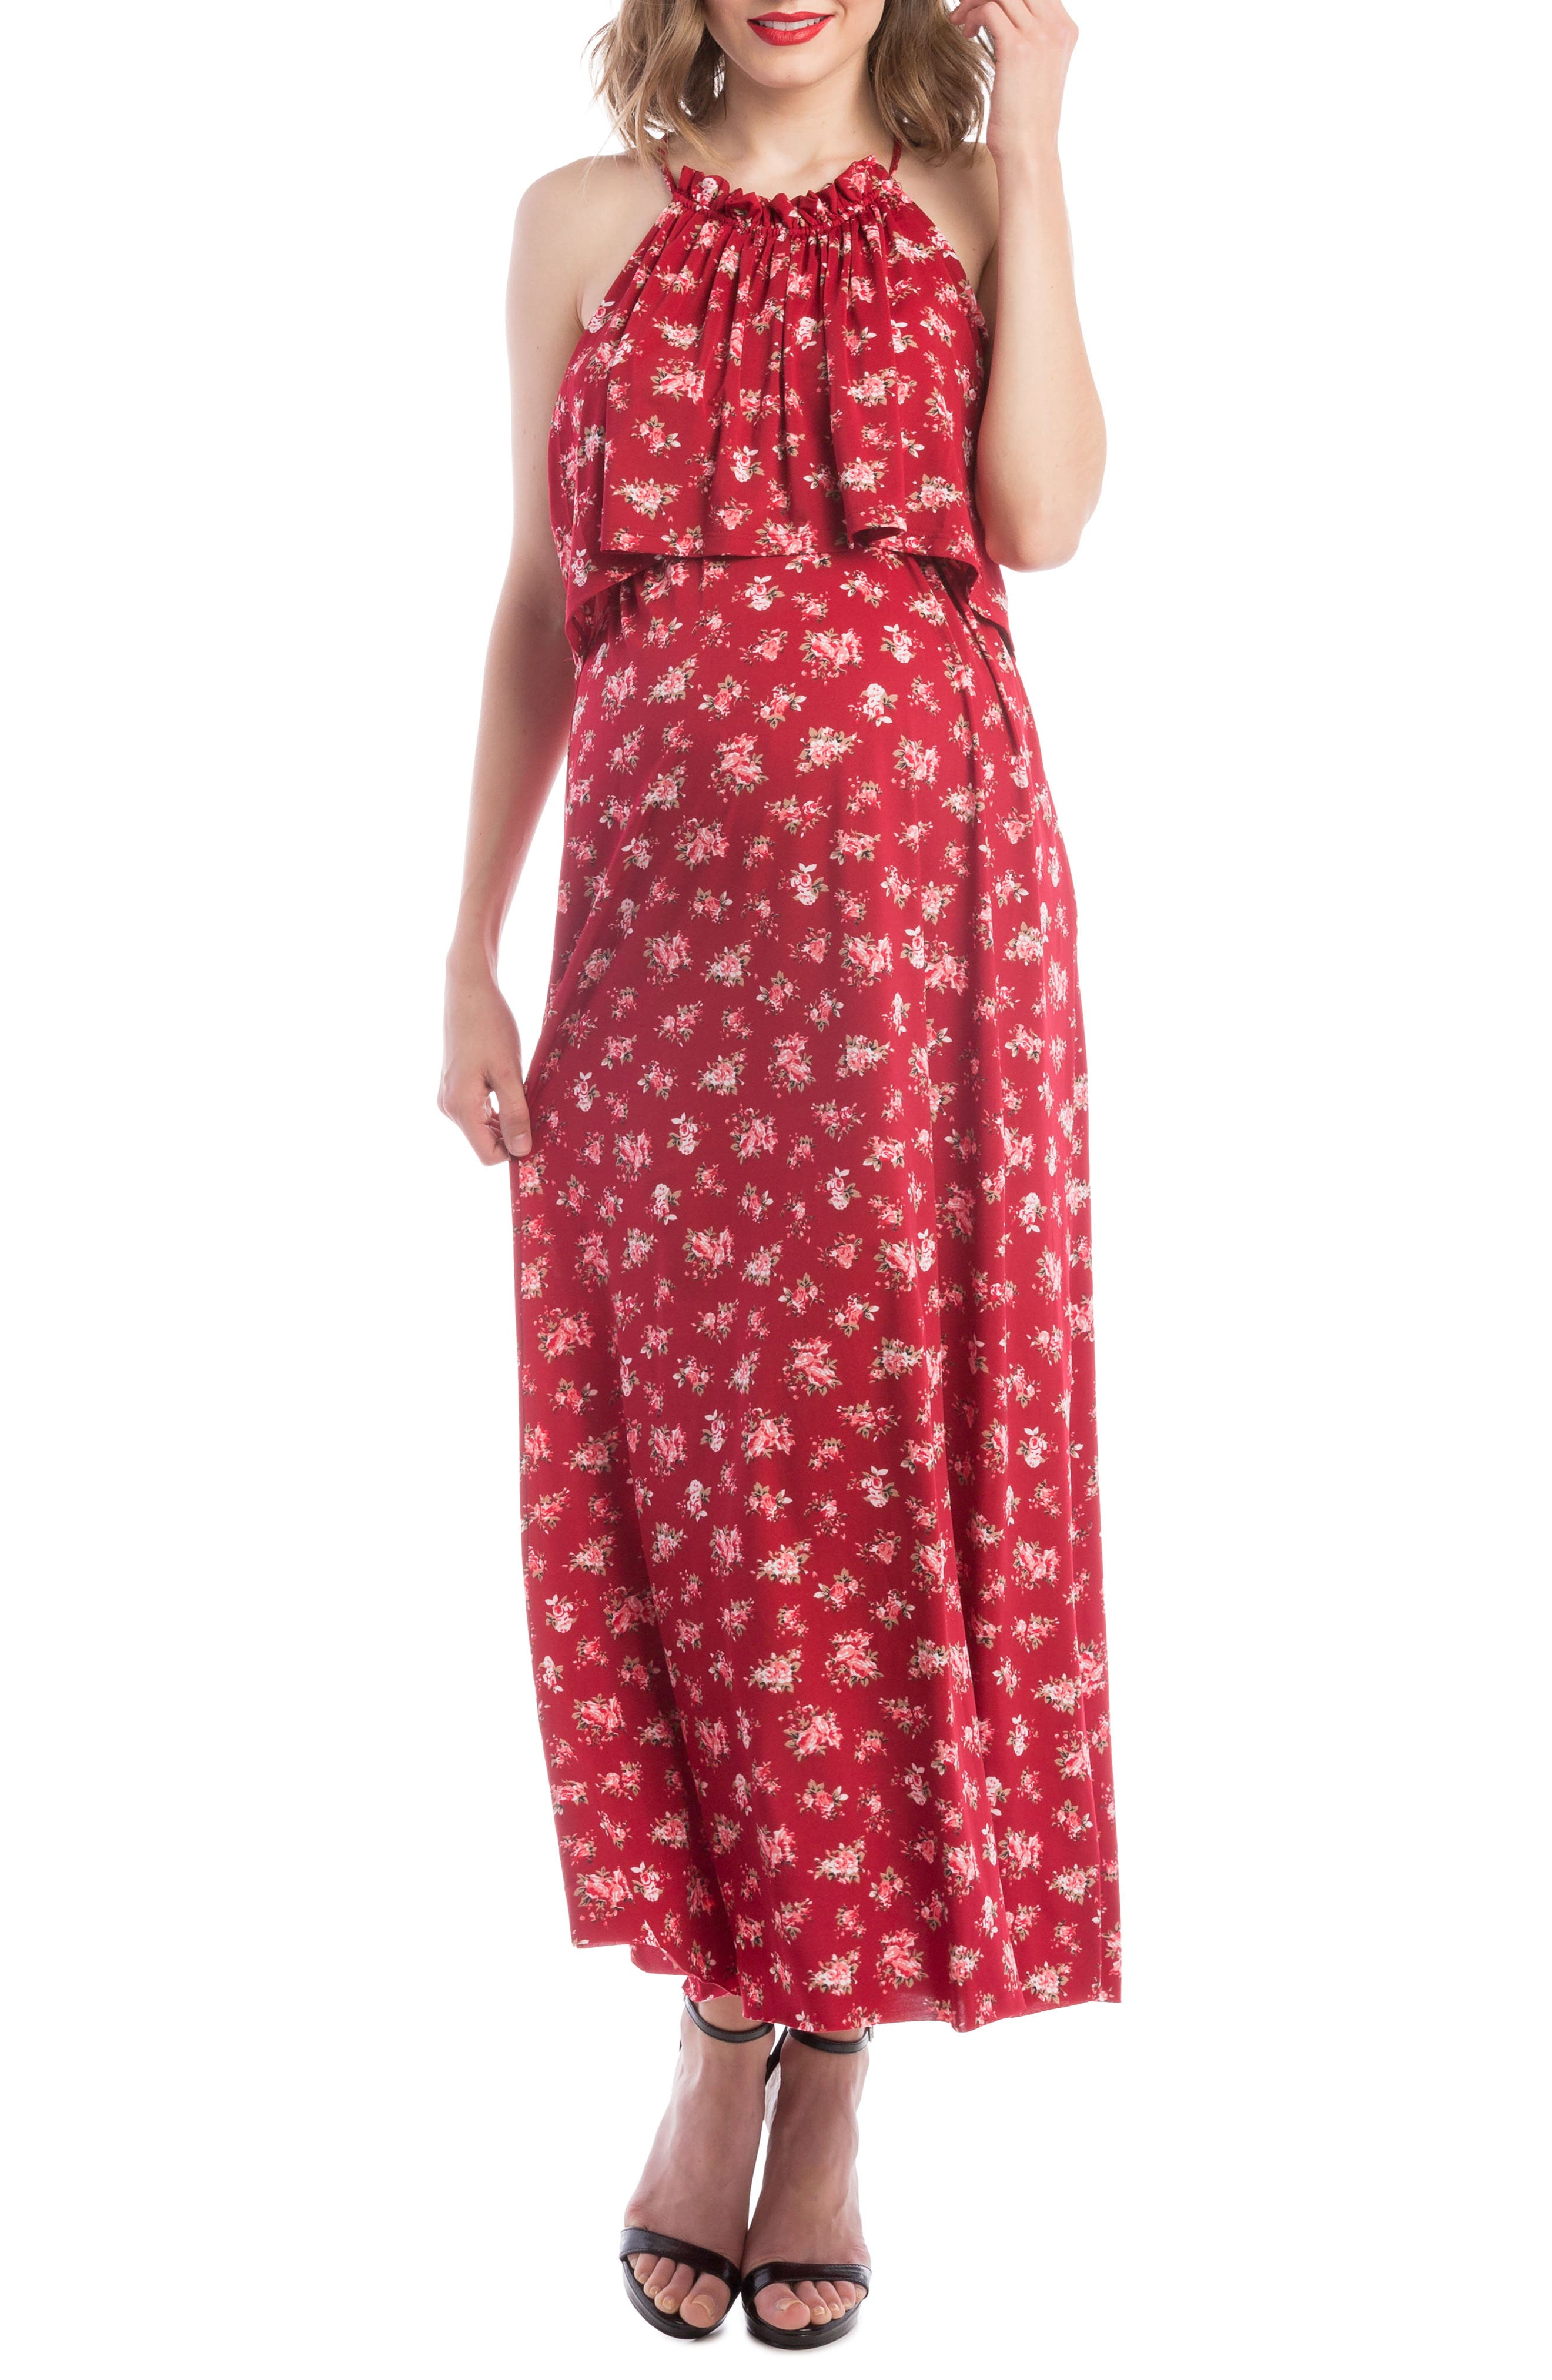 Lilac Clothing Maternity/Nursing Maxi Dress